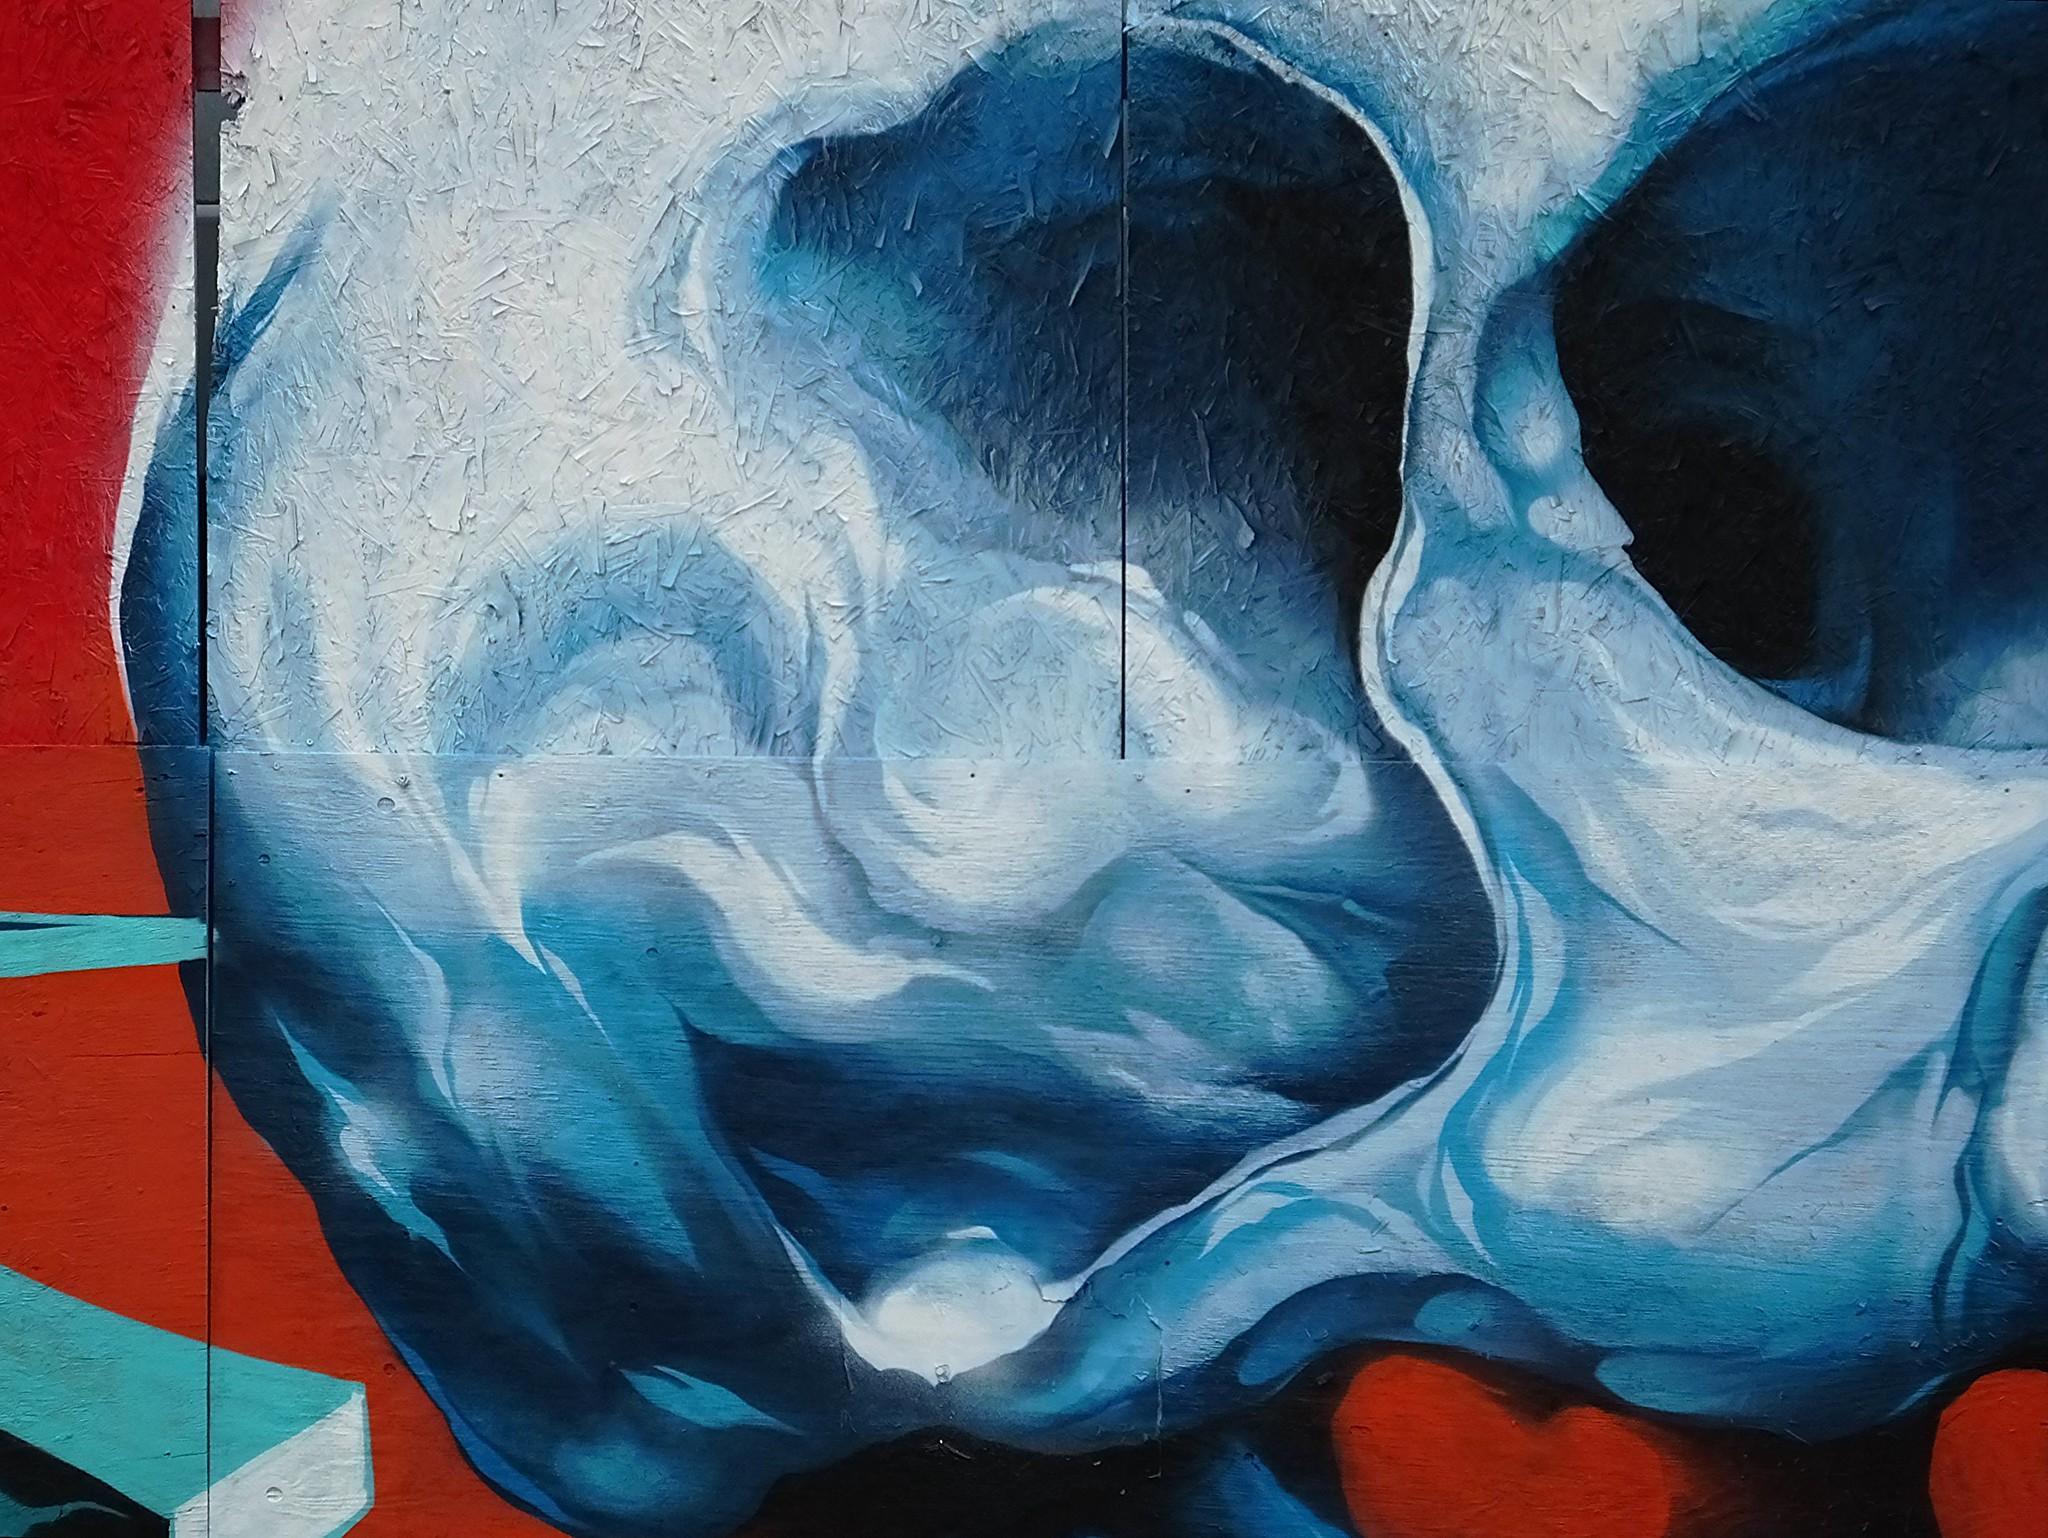 Cardiff street art